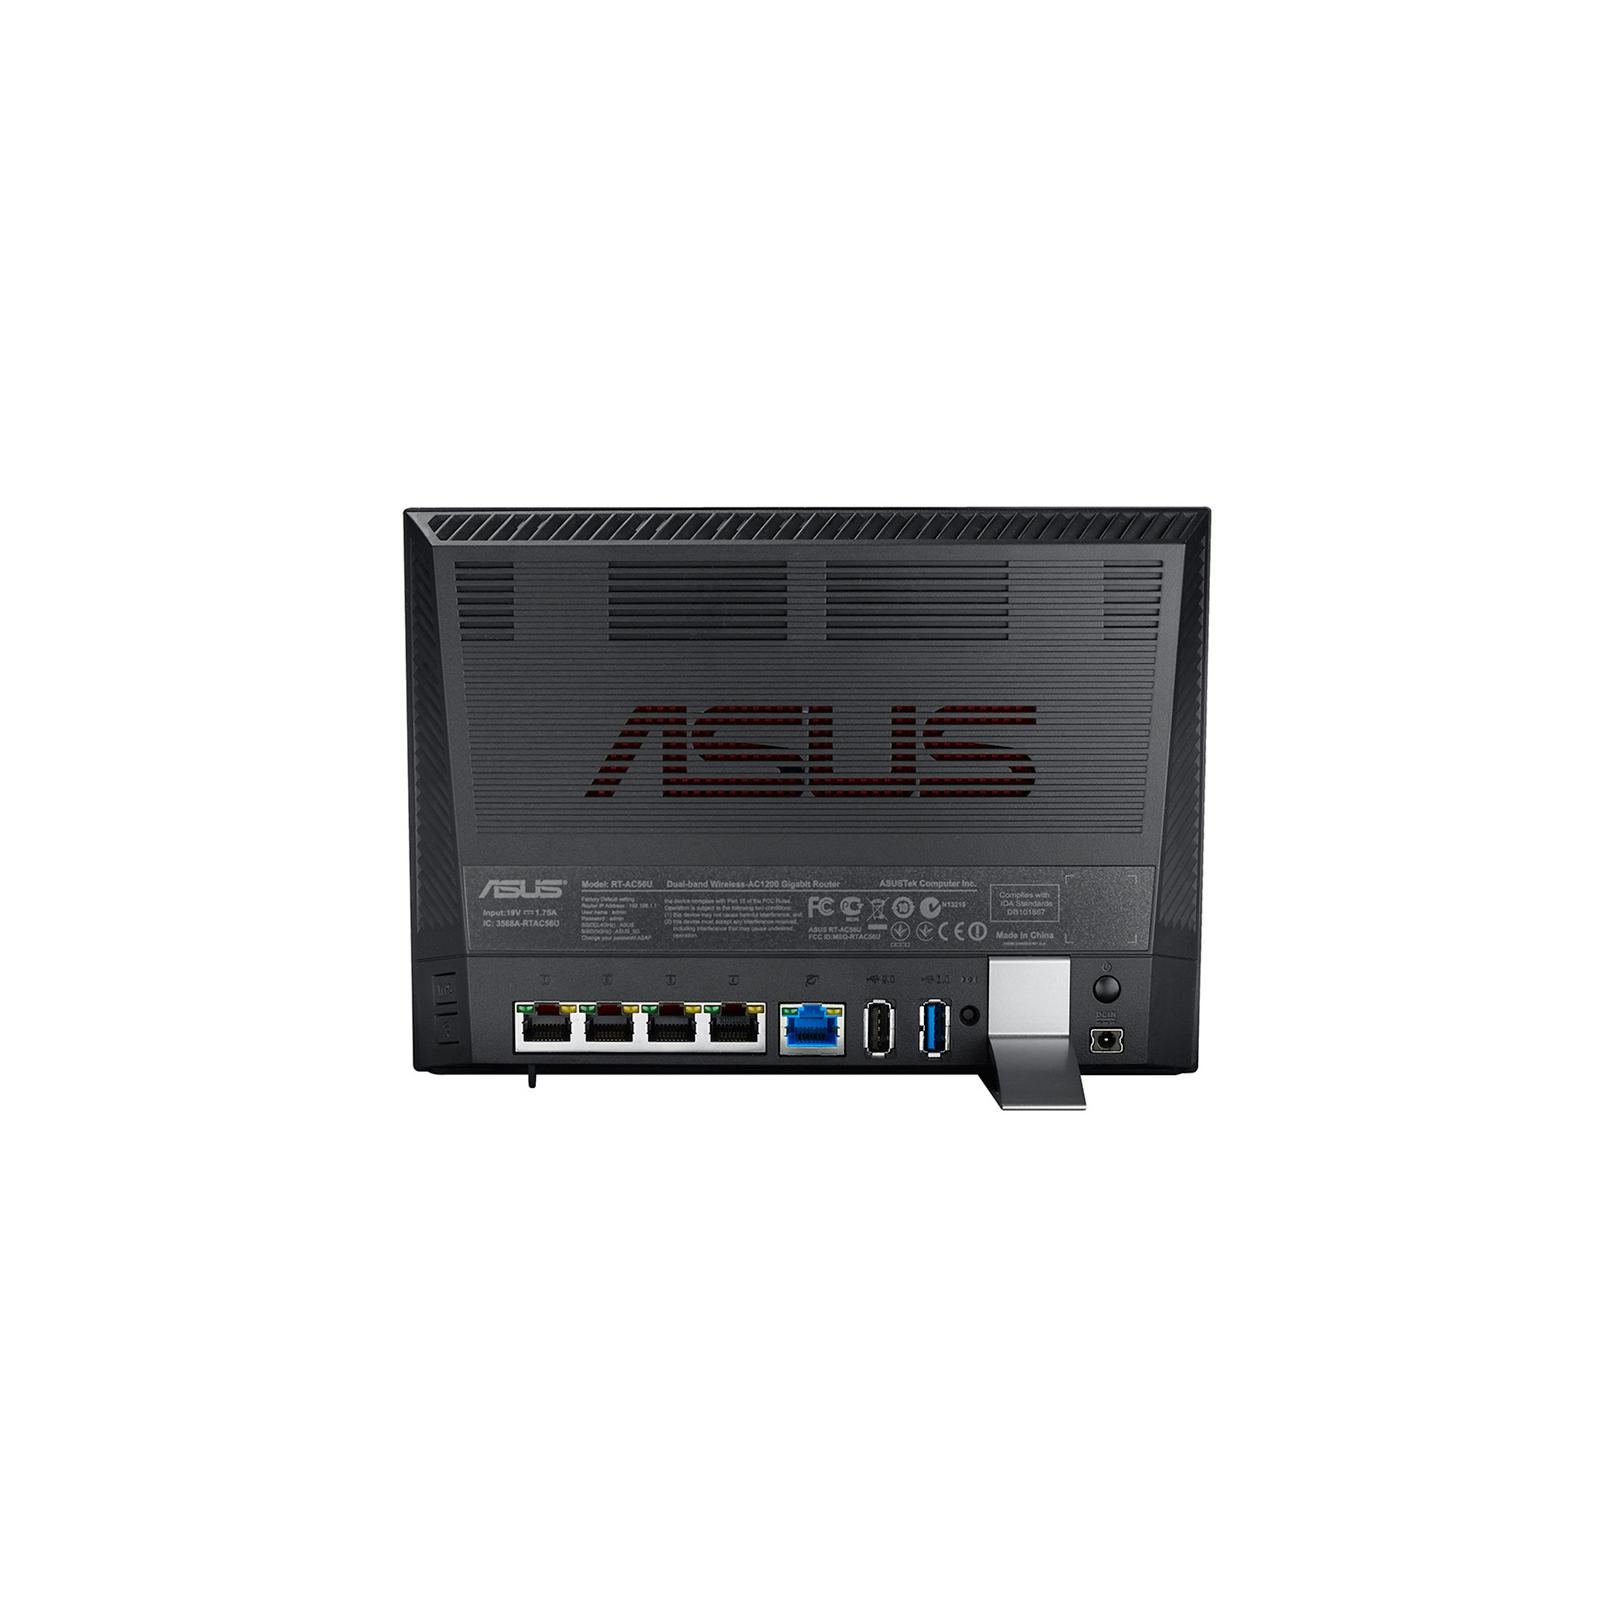 Маршрутизатор ASUS RT-AC56U изображение 6